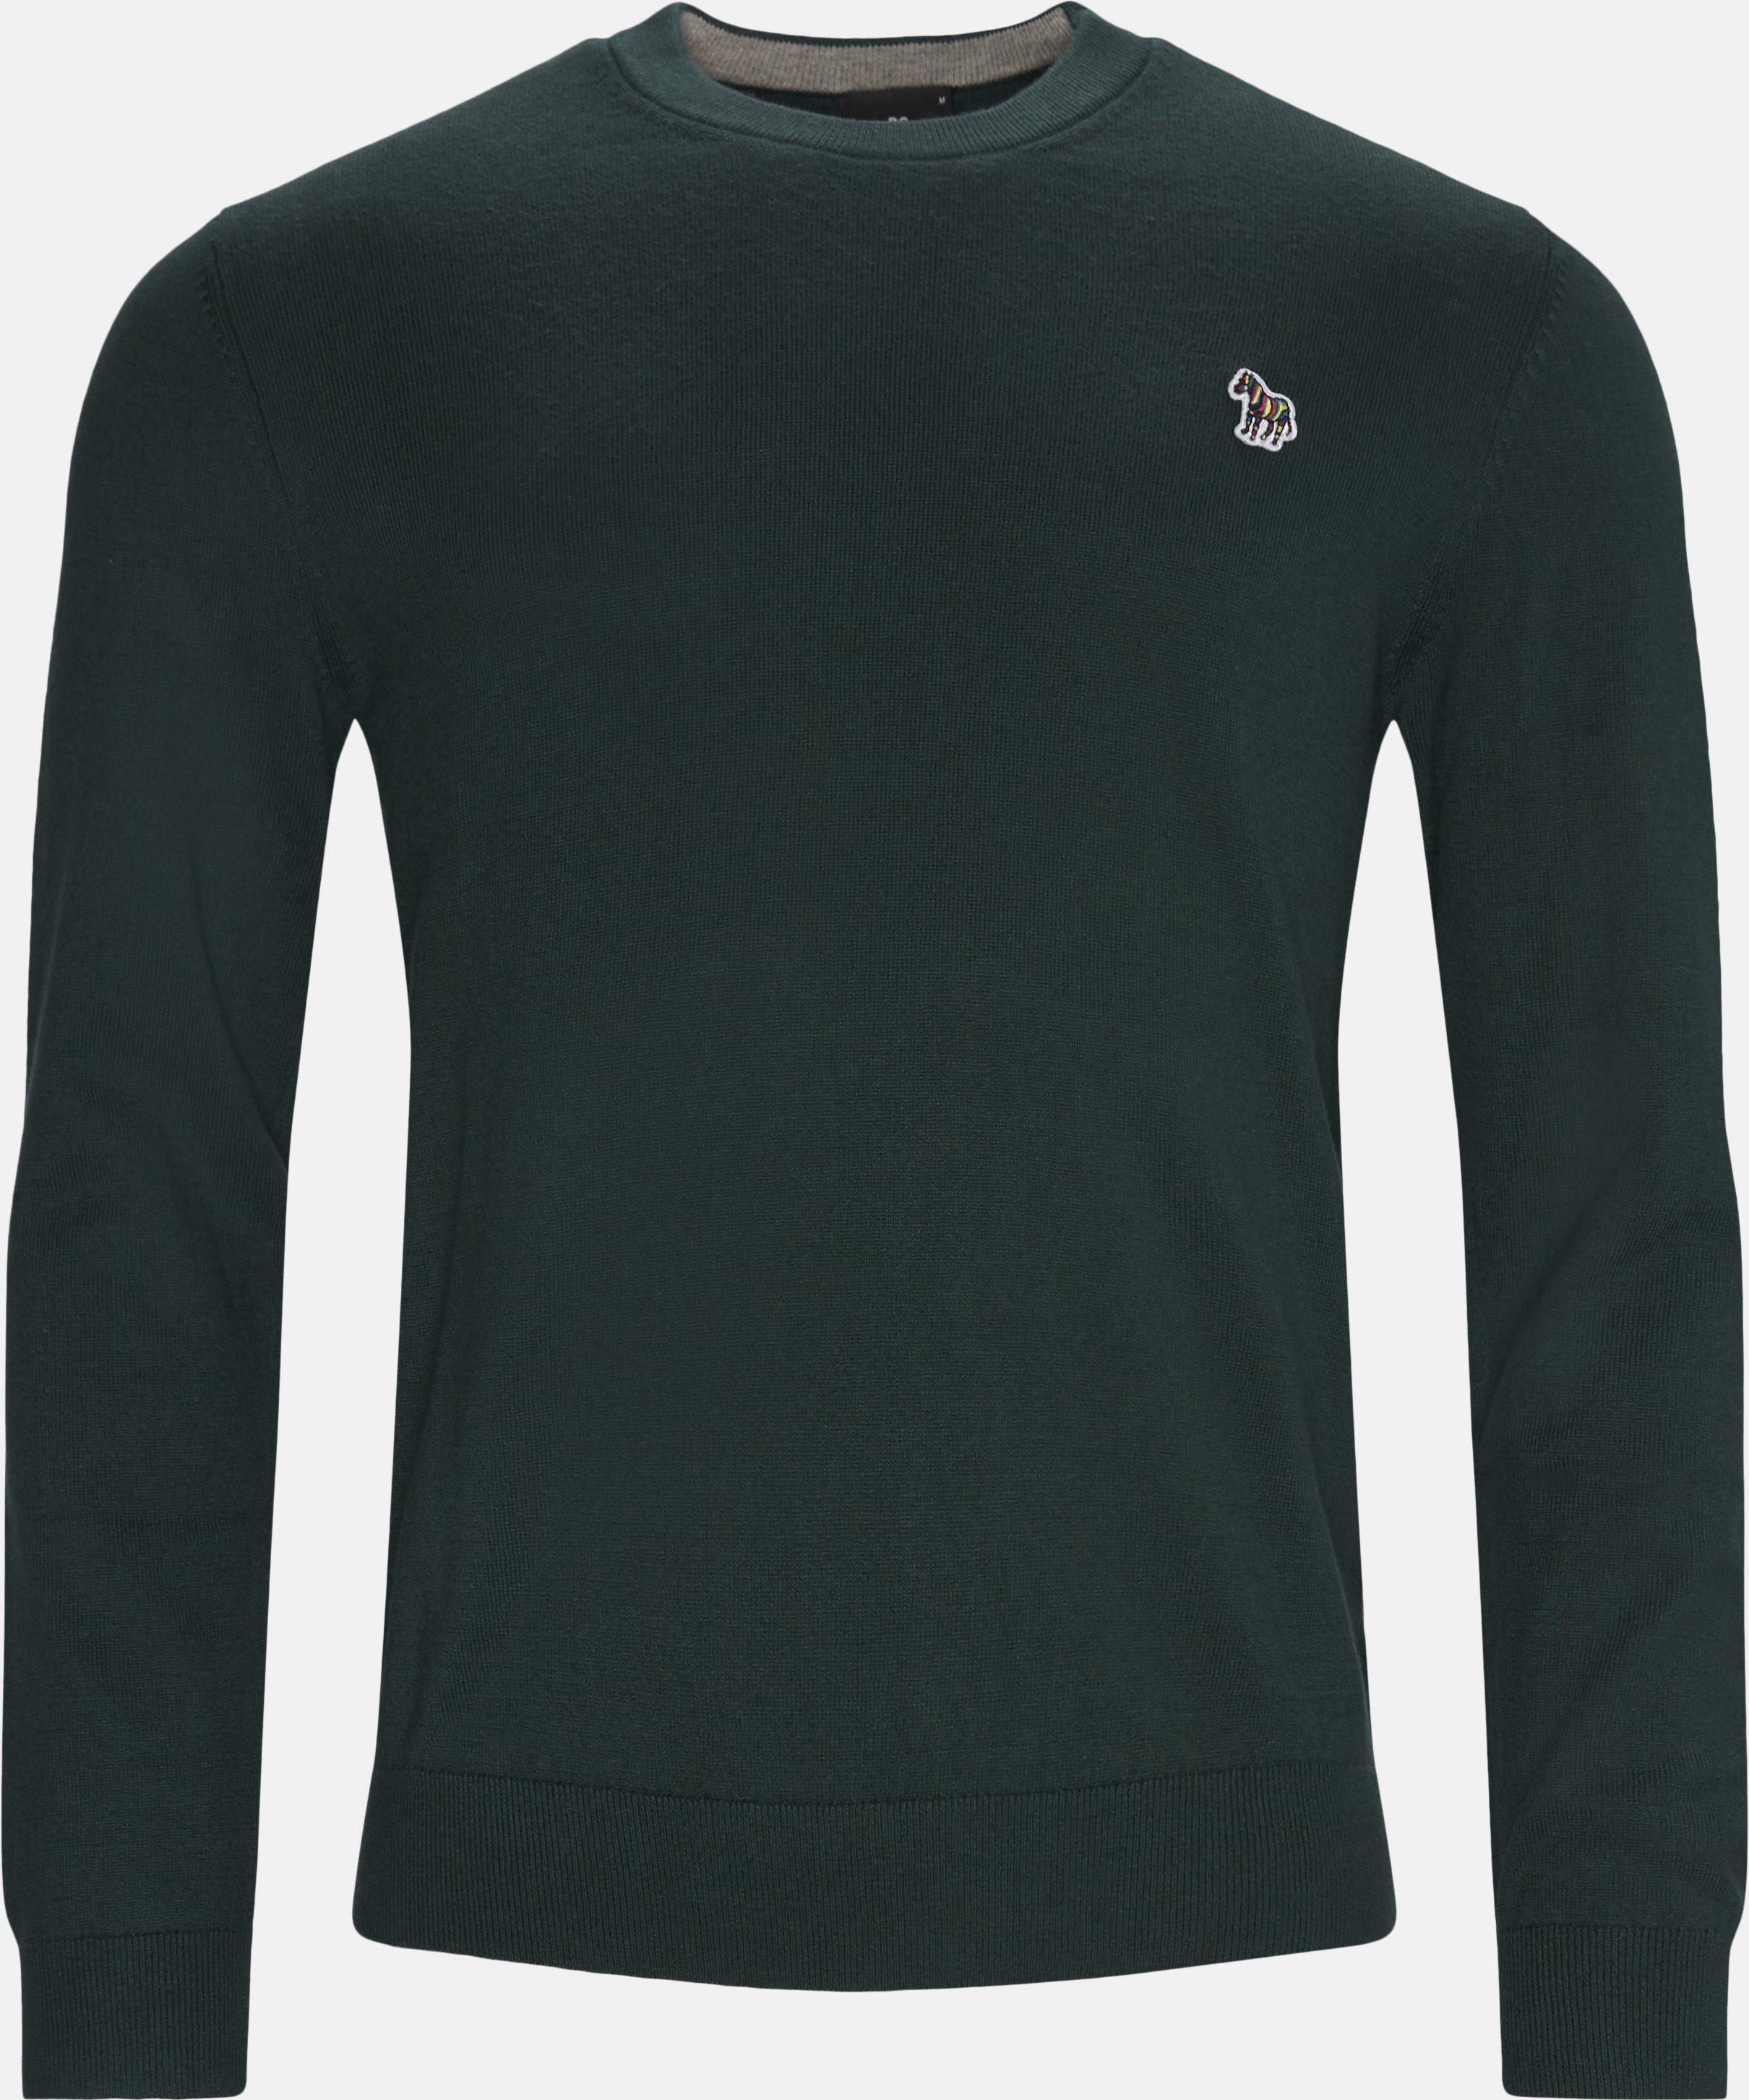 Knitwear - Regular fit - Green